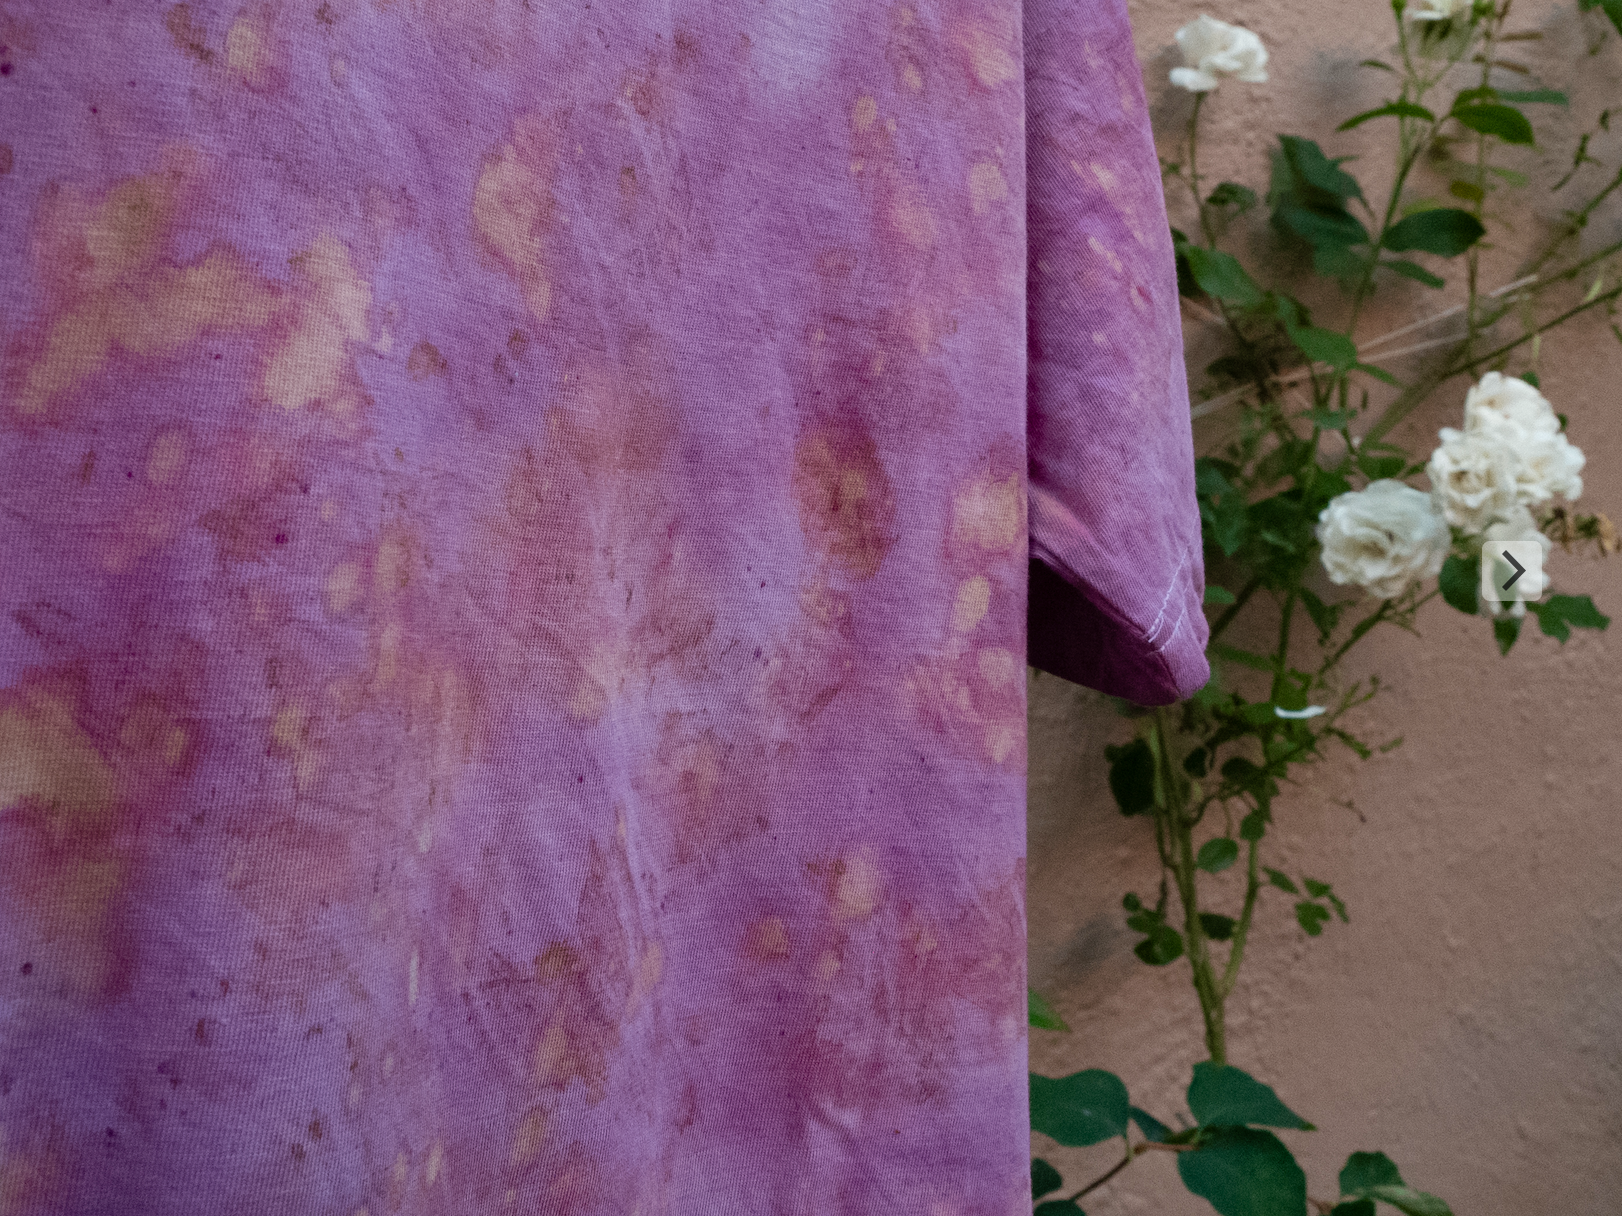 Compos, cochineal detalj .png